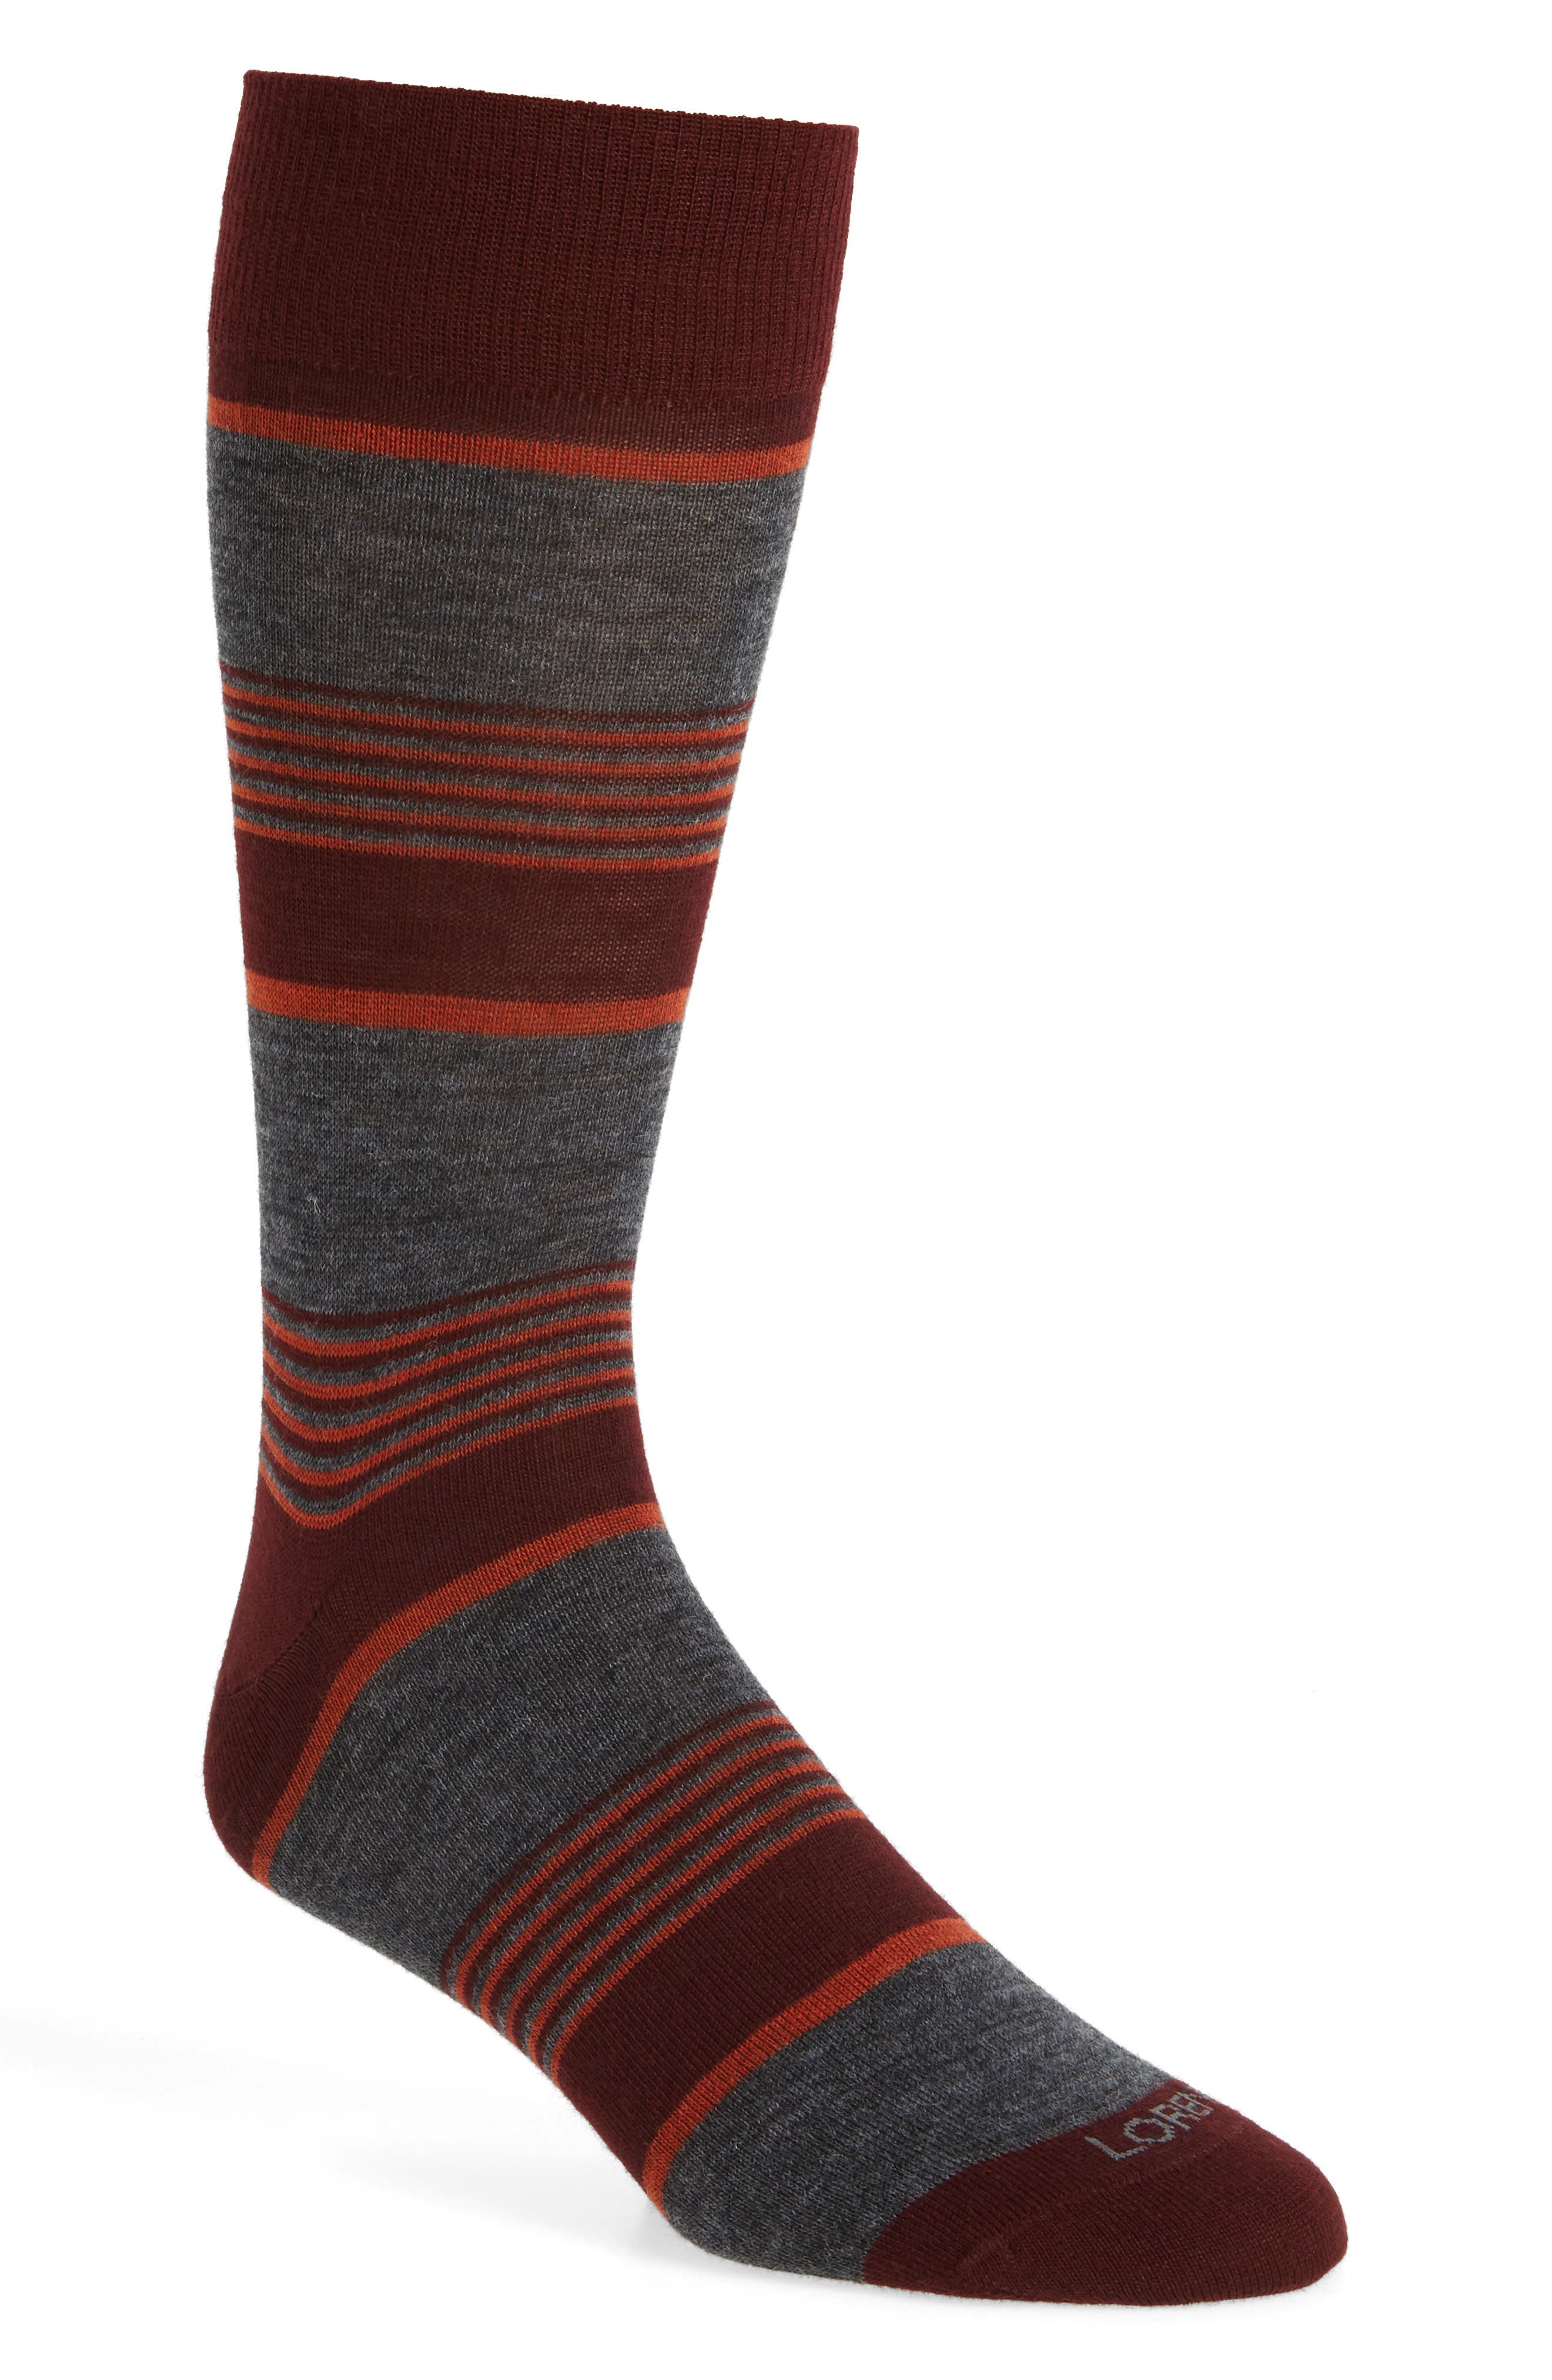 Lorenzo Uomo Colorblock Stripe Crew Socks